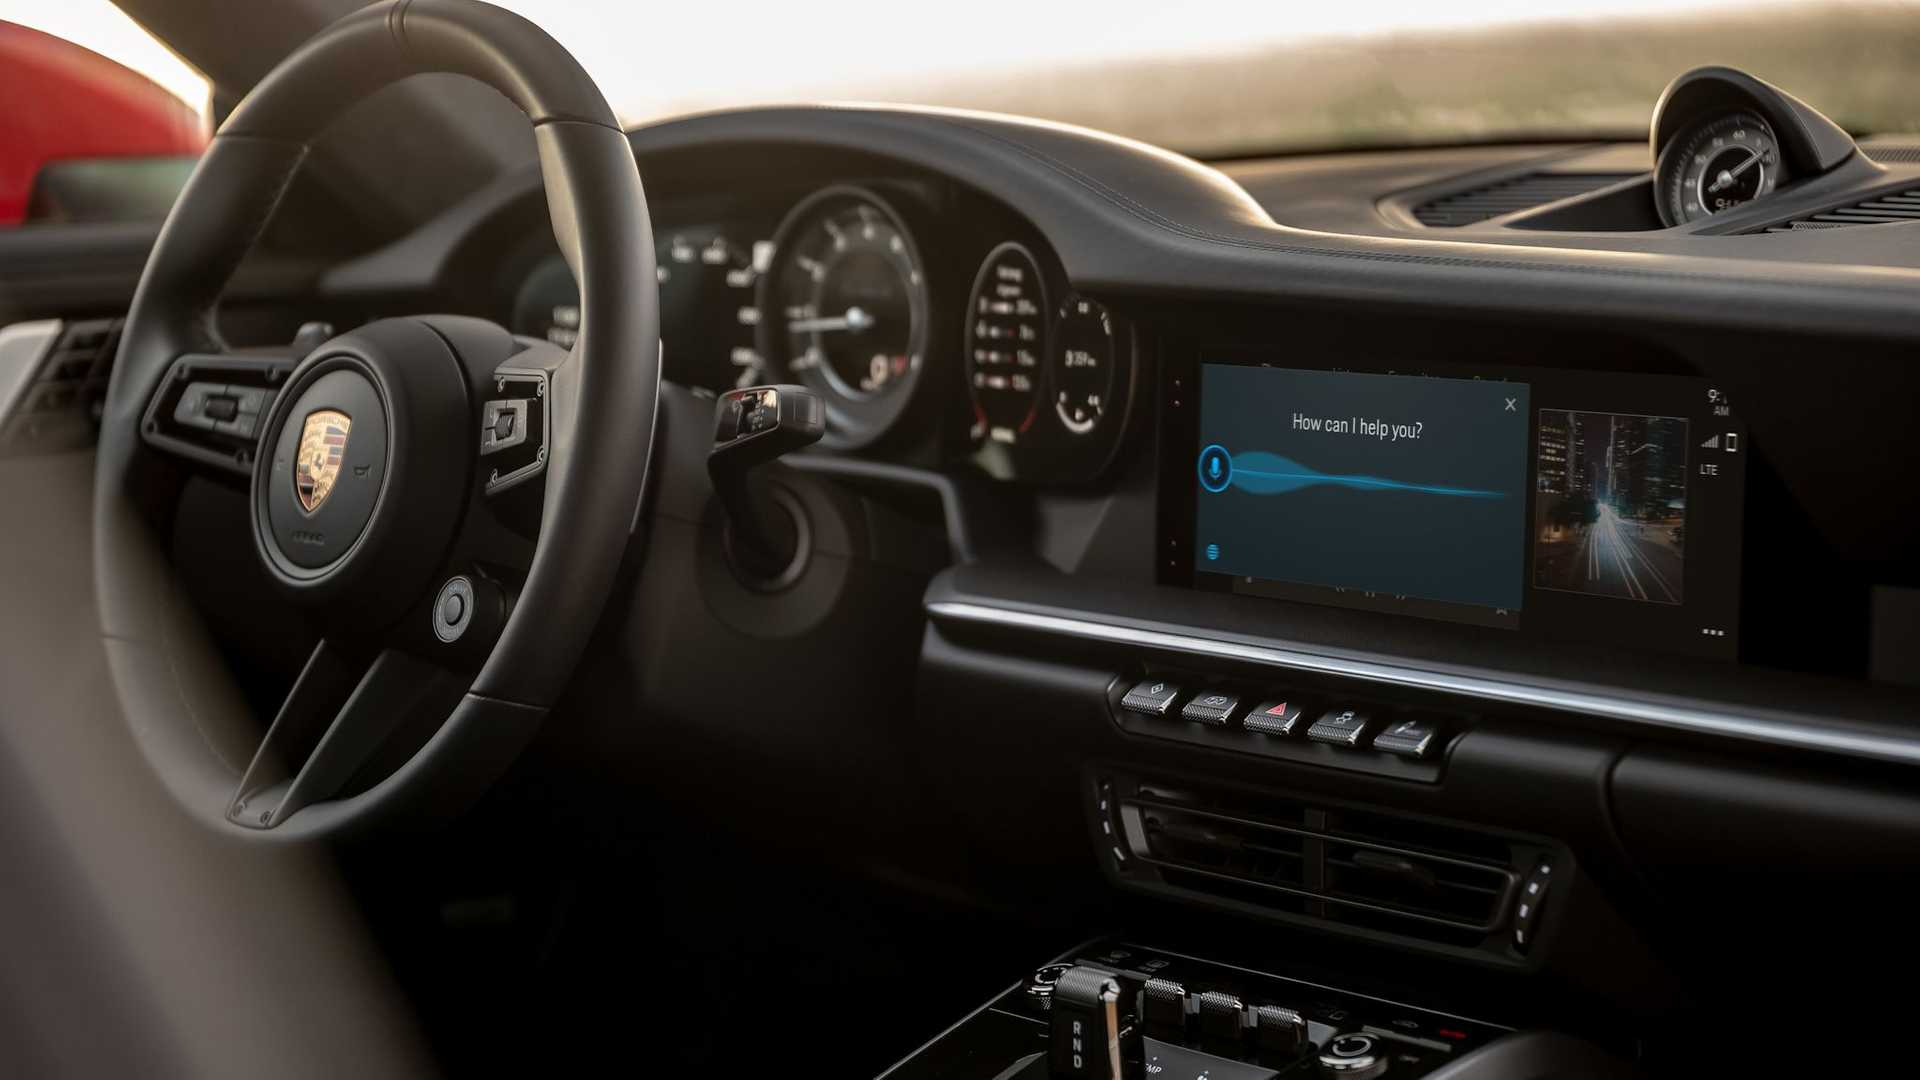 El Porsche Communication Management 6.0 llegará este verano